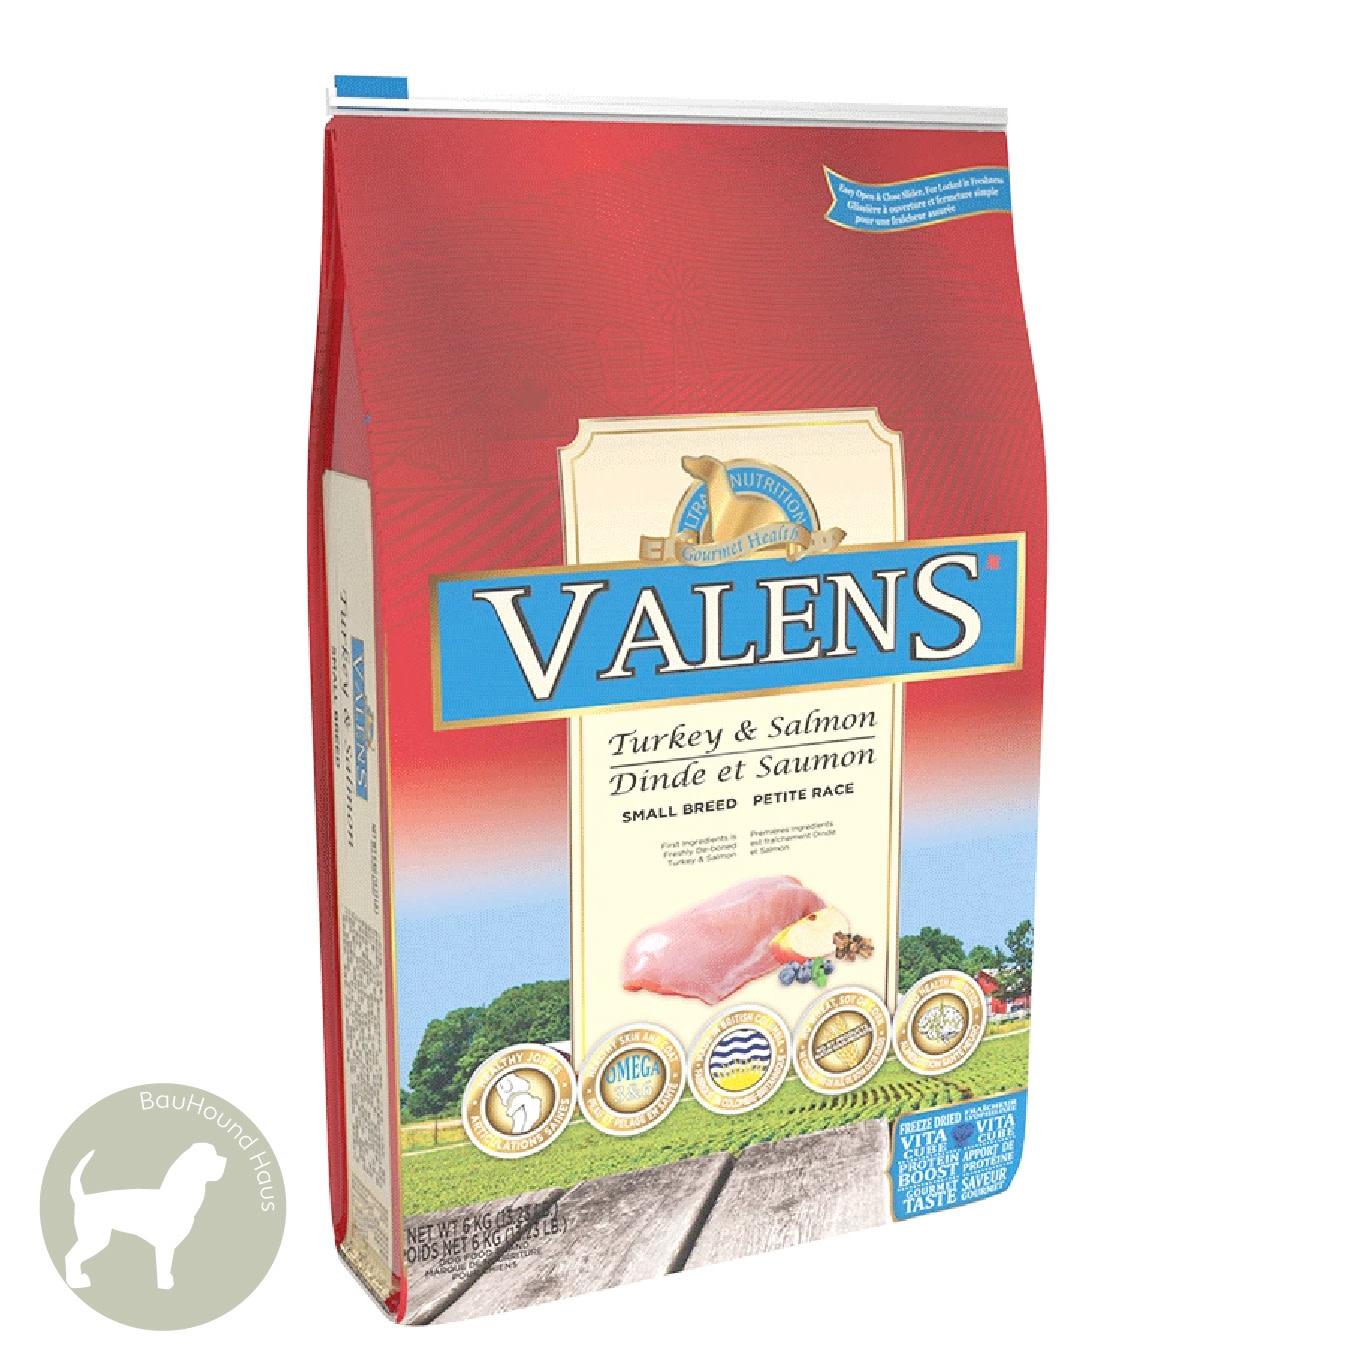 Valens Valens Small Breed Turkey & Salmon, 6.6lb